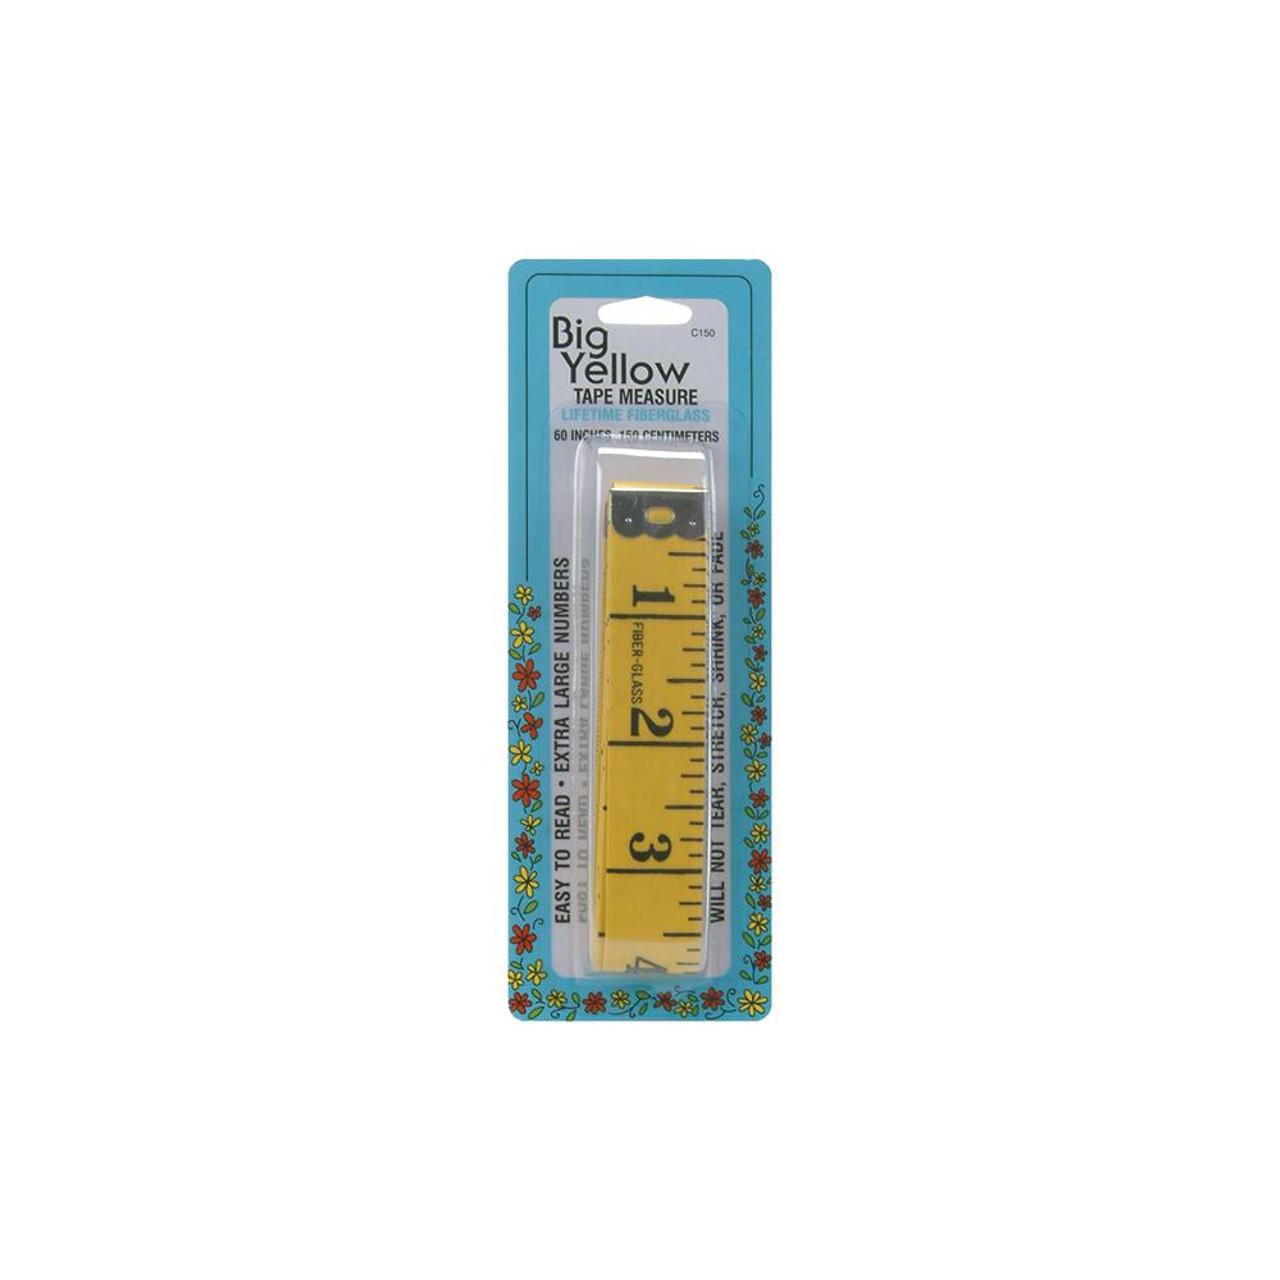 Collins Big Yellow Tape Measure 3/4